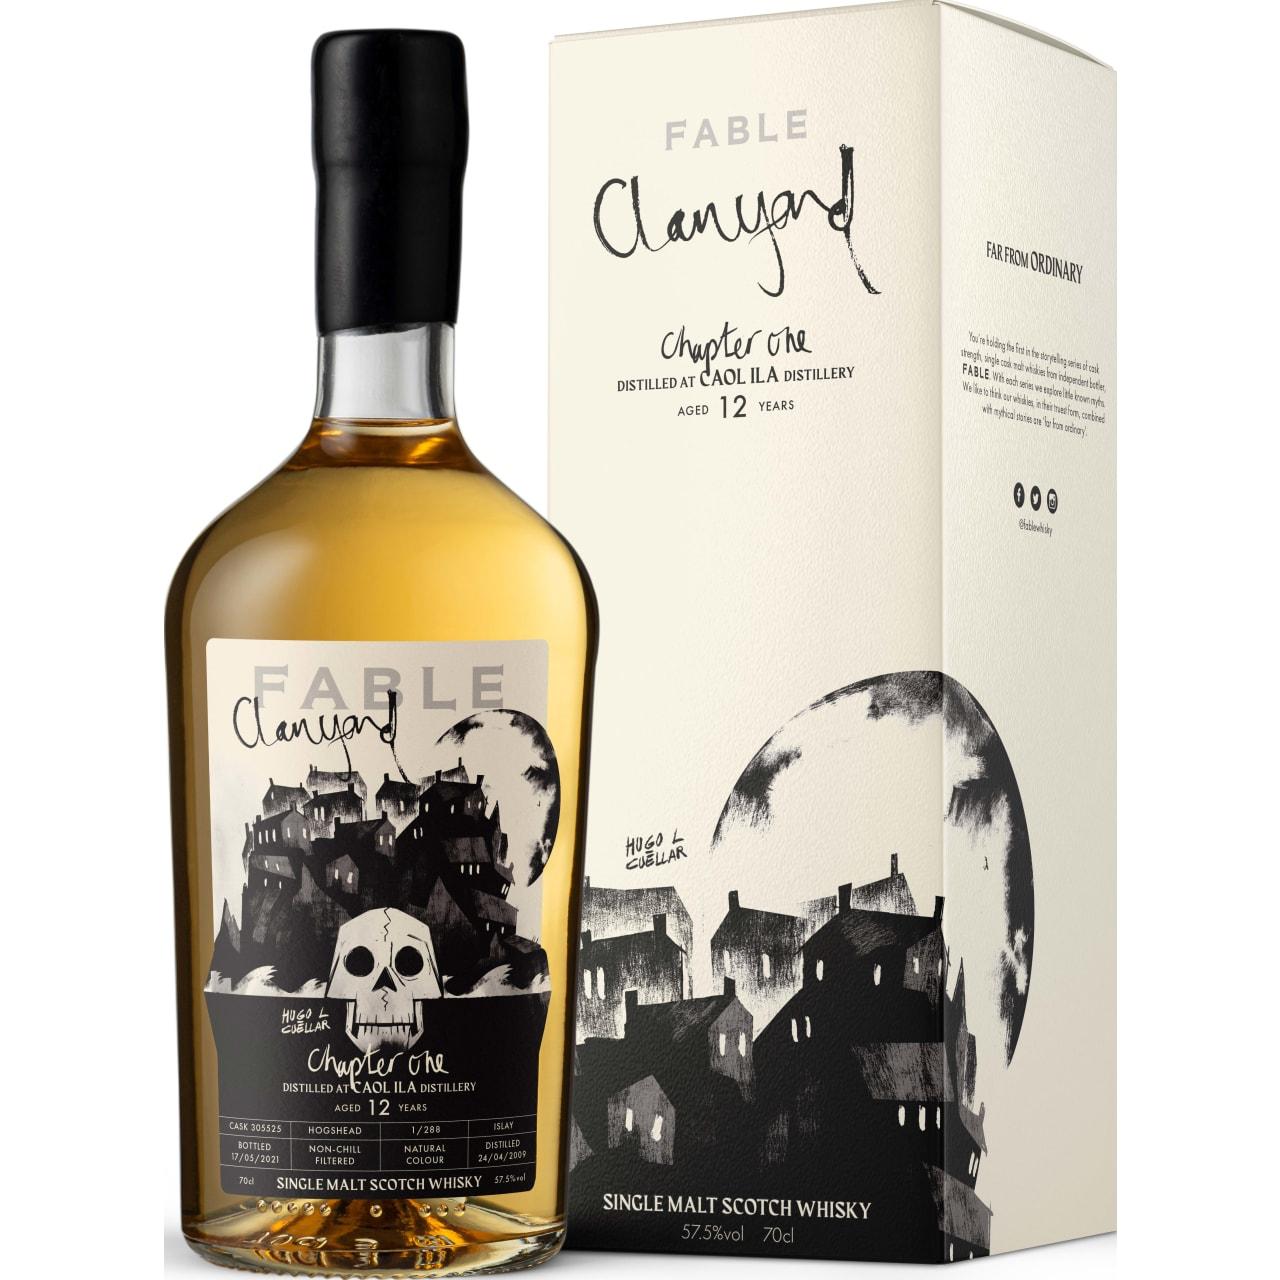 Product Image - Fable Chapter 1 Clanyard, Caol Ila 12yo Whisky